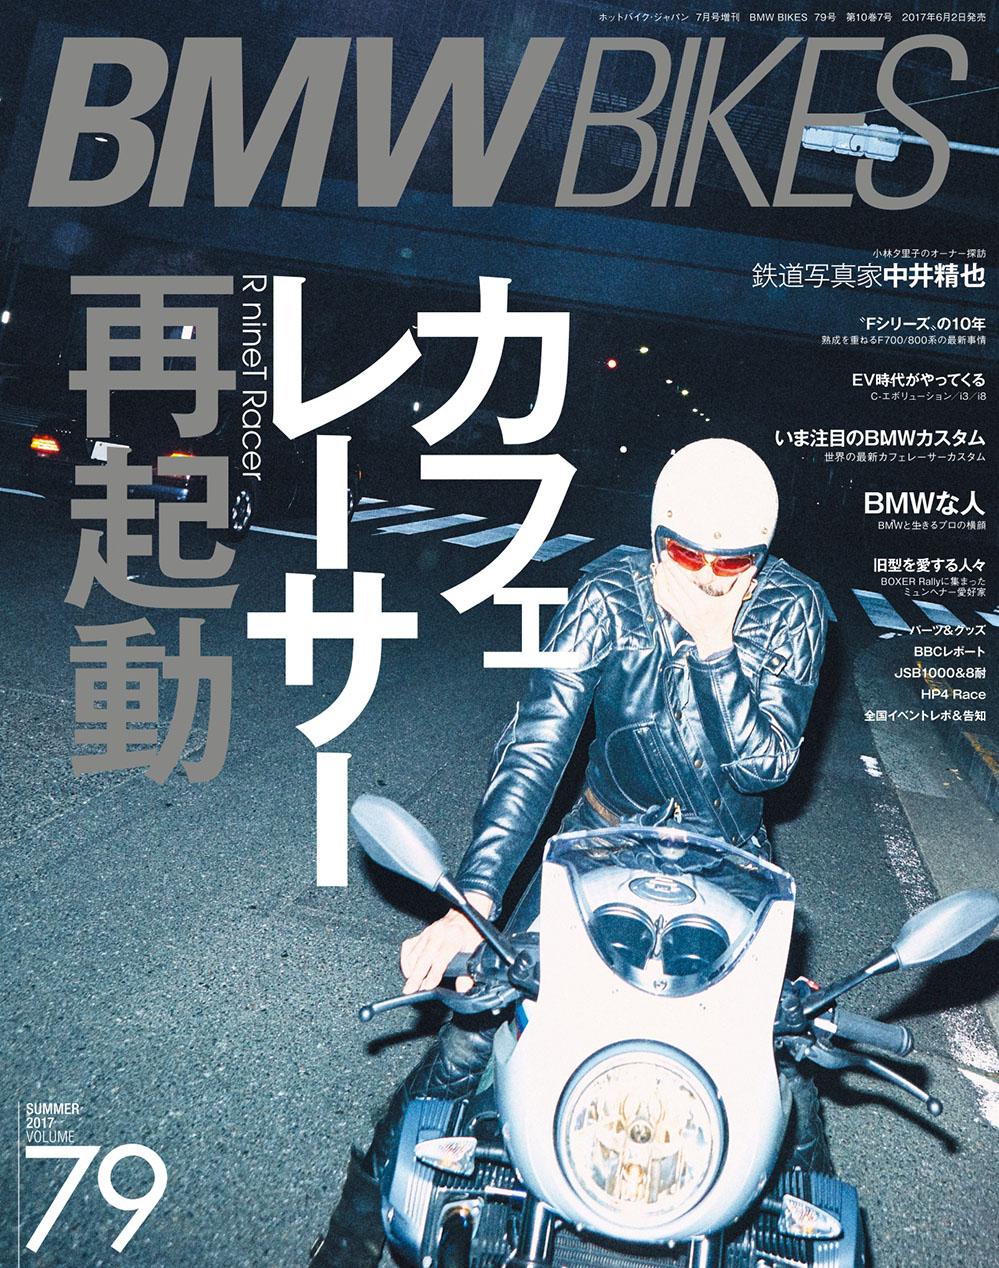 bmw bikes Vol.79 オリジナルパーツ掲載 46works